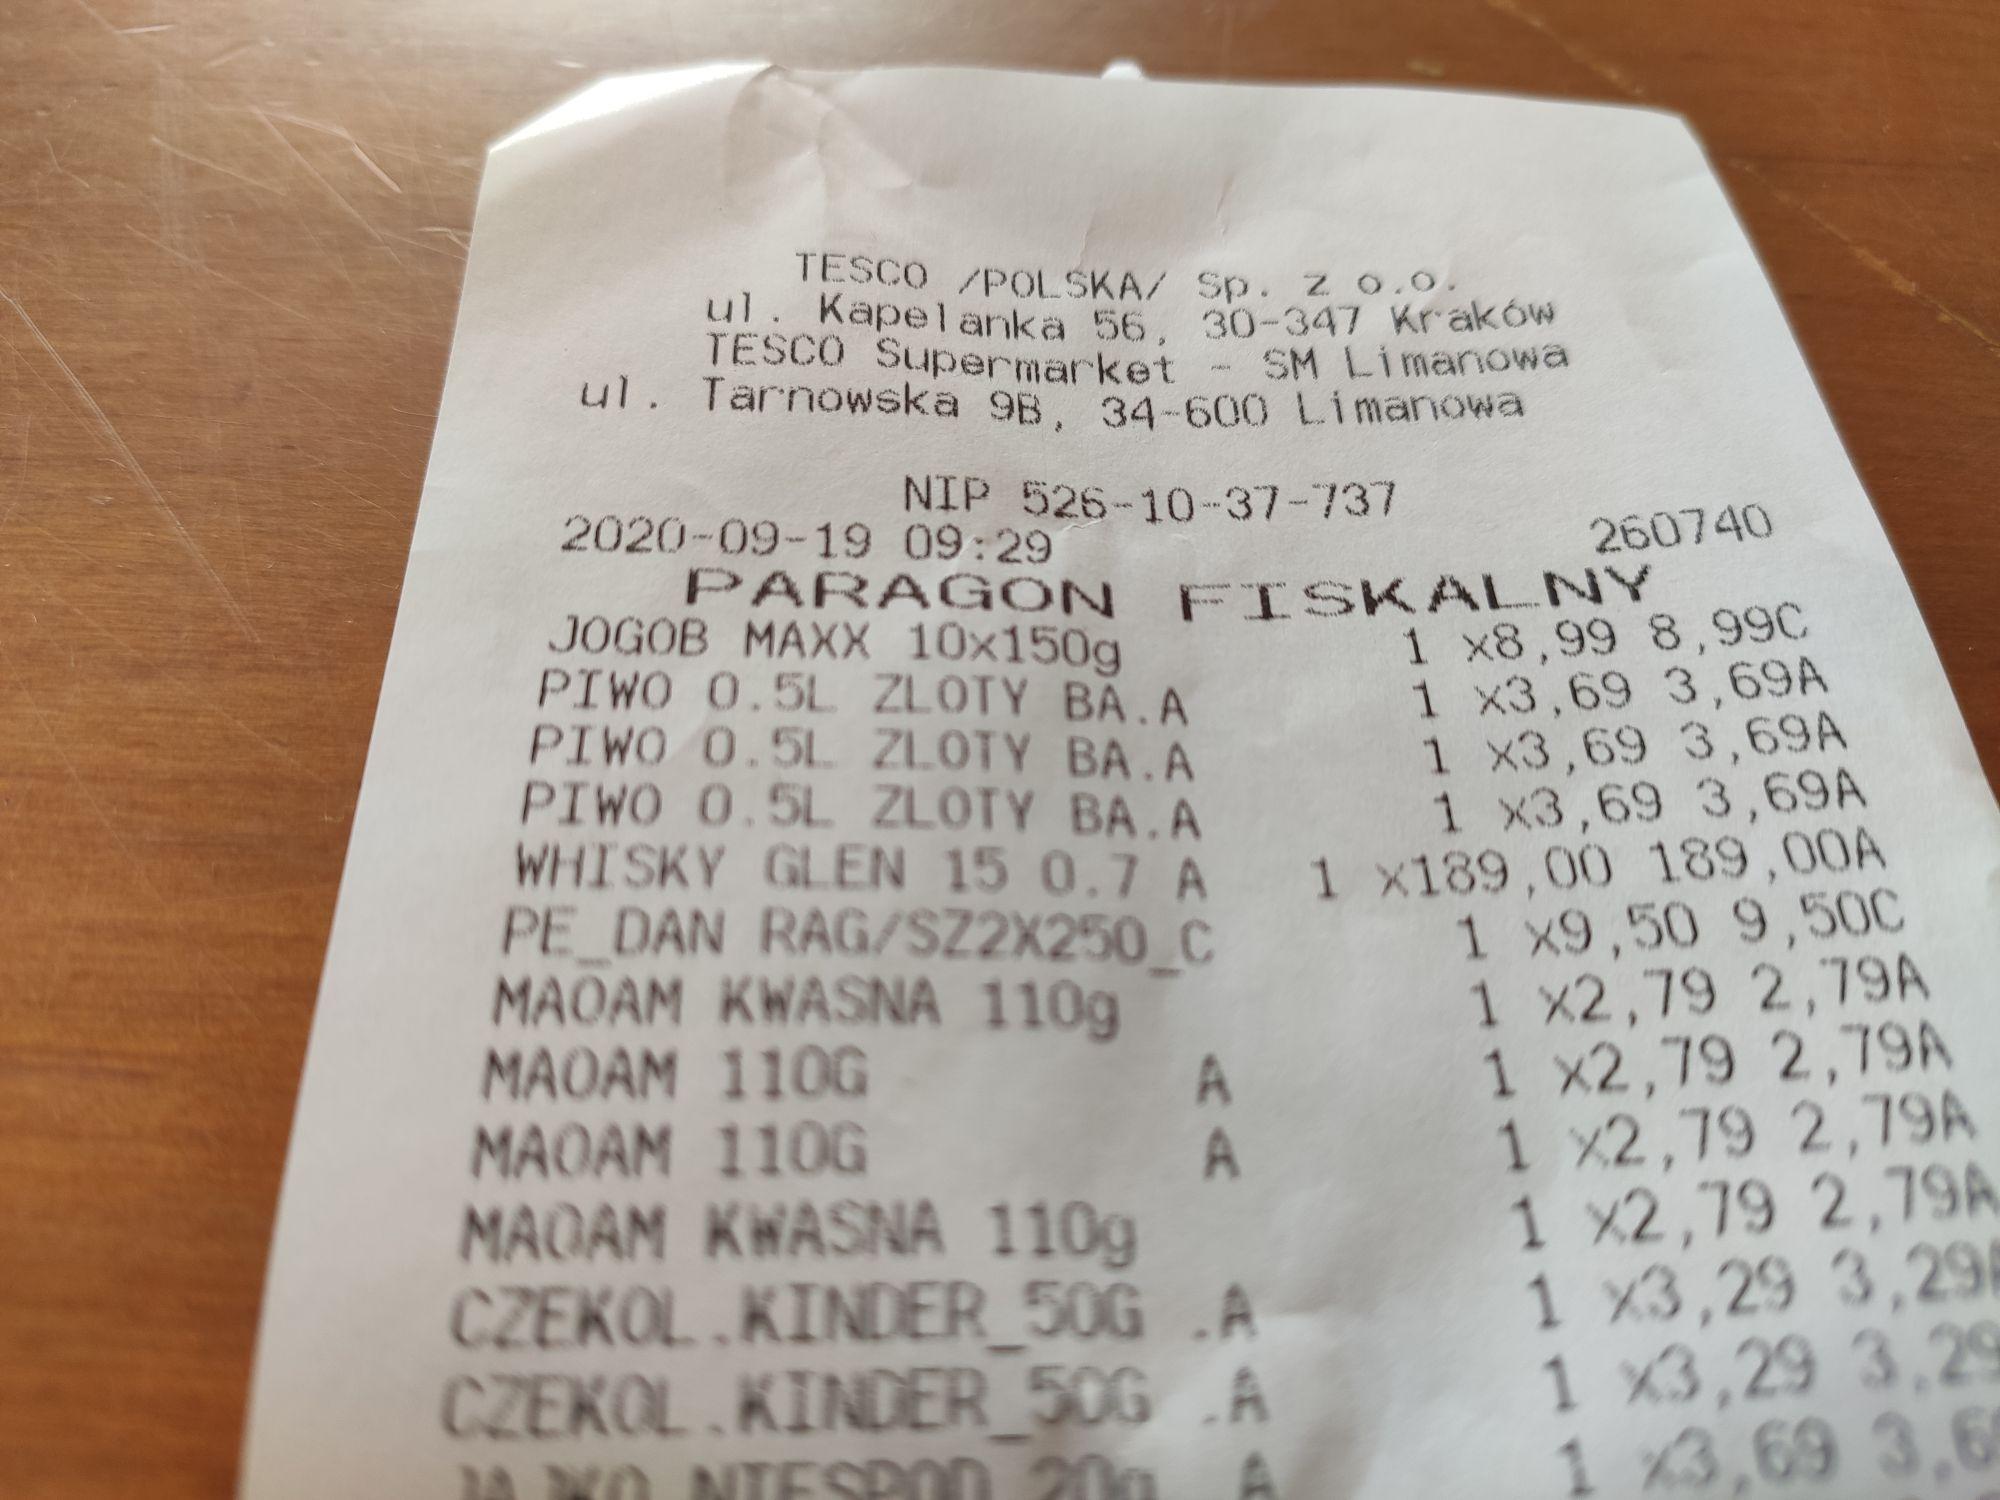 Whisky Glenfiddich 15 YO 0,7 Tesco Limanowa